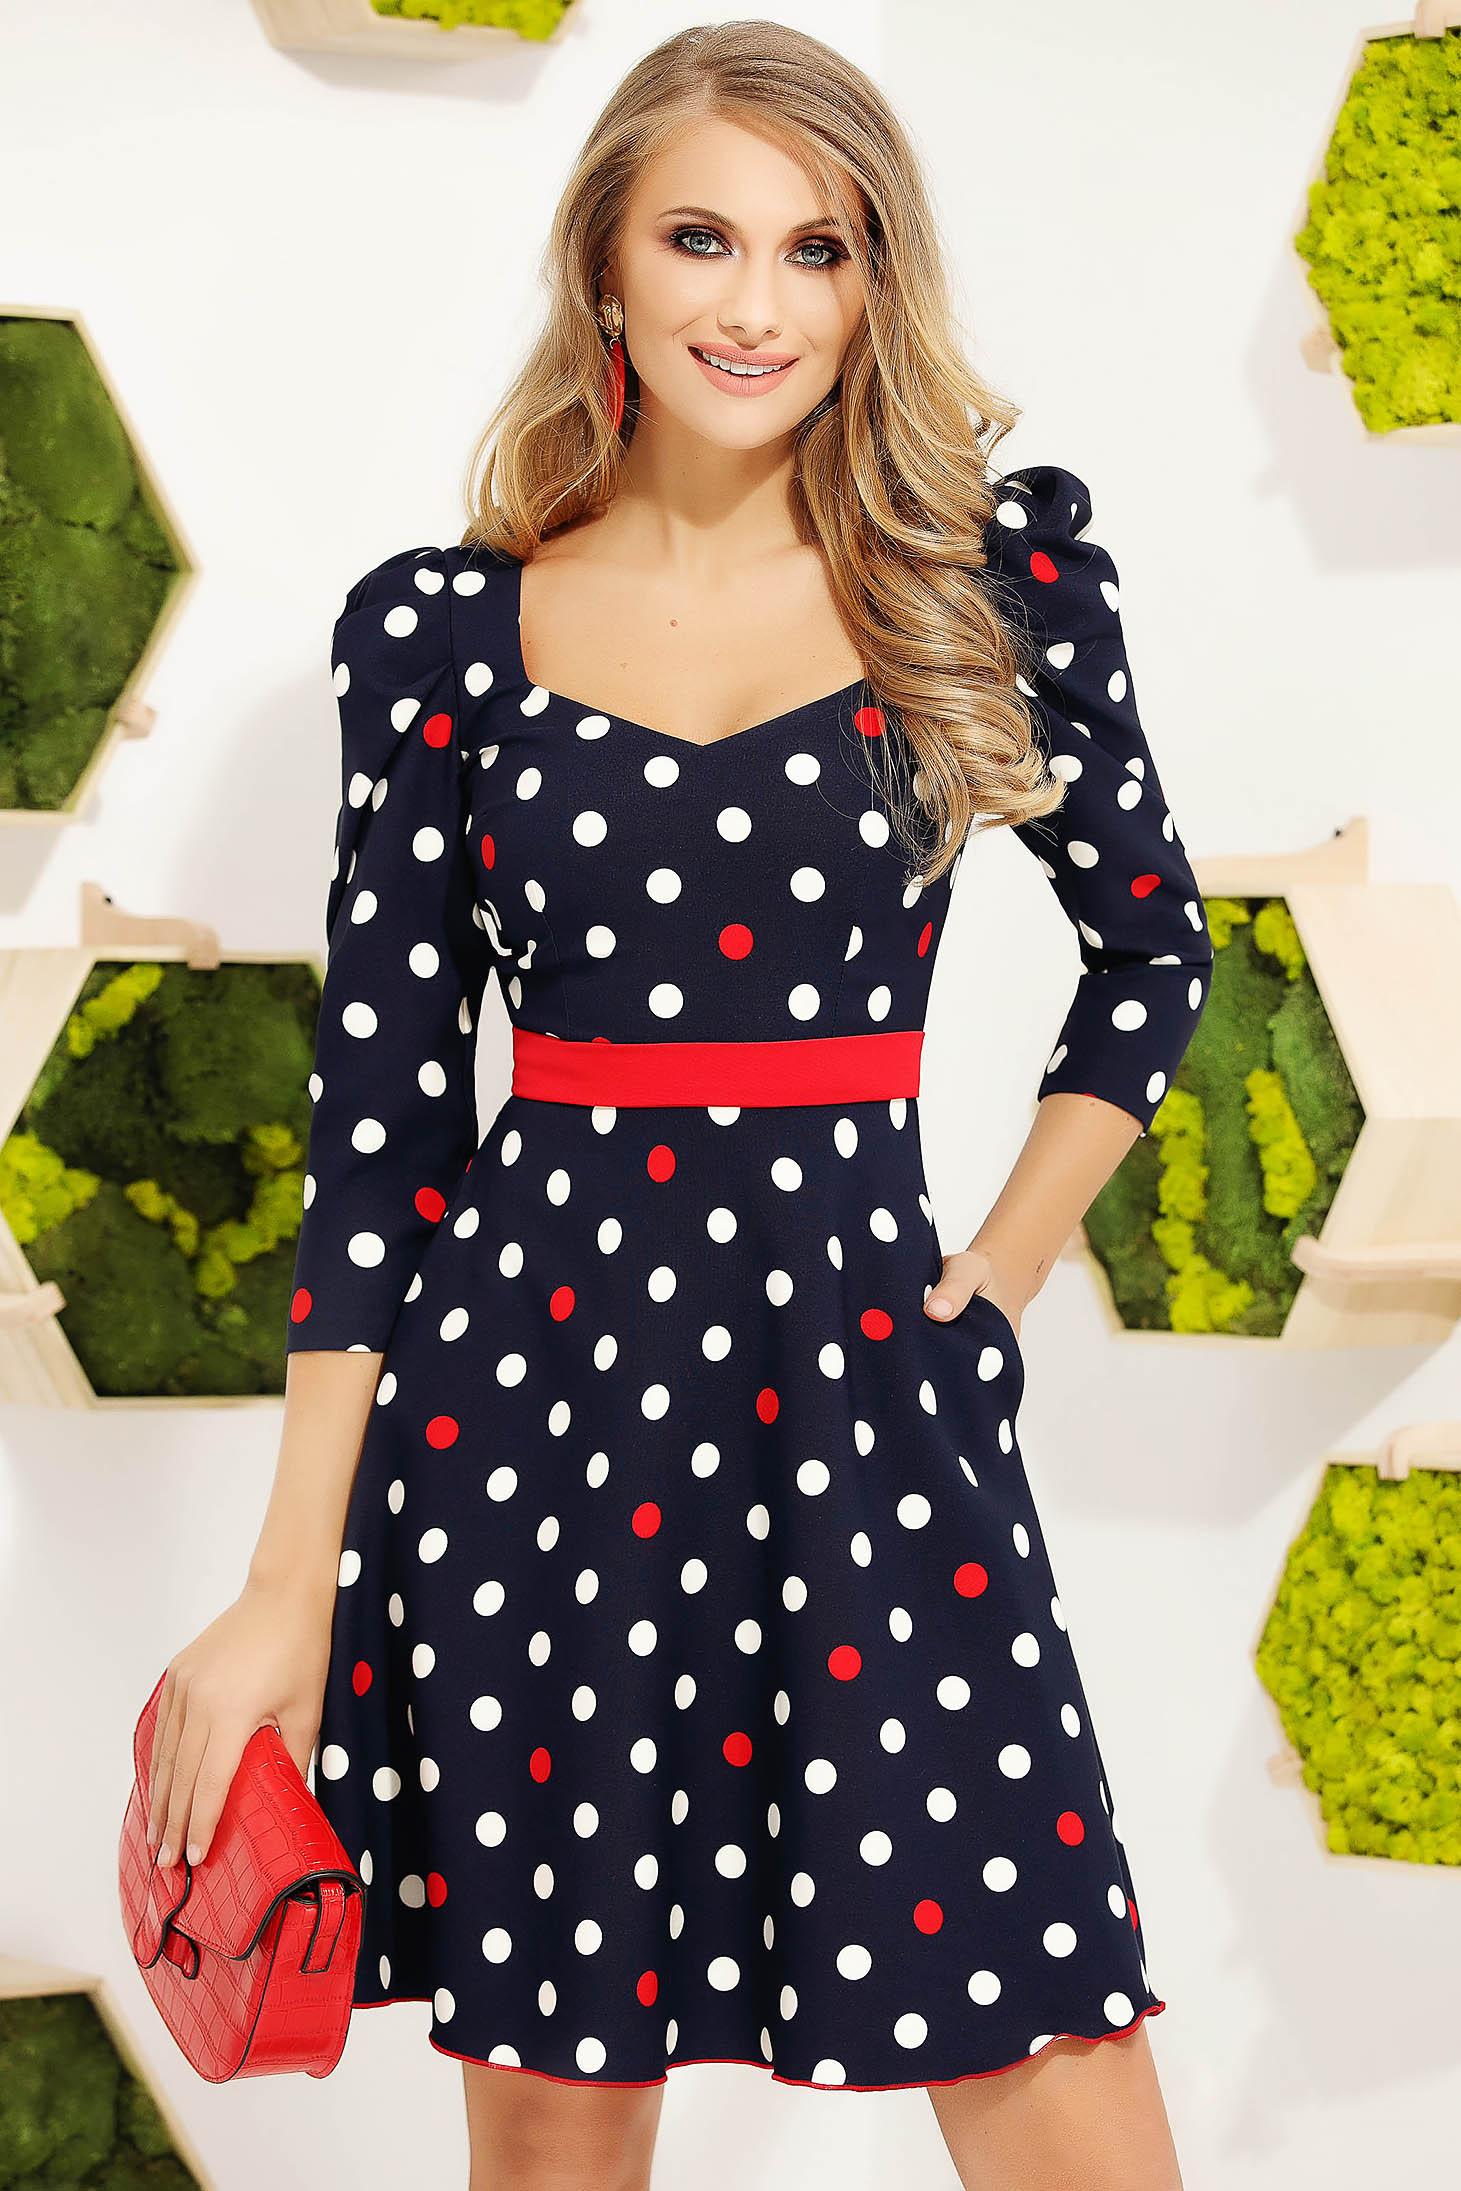 Red dress elegant short cut cloche accessorized with belt high shoulders